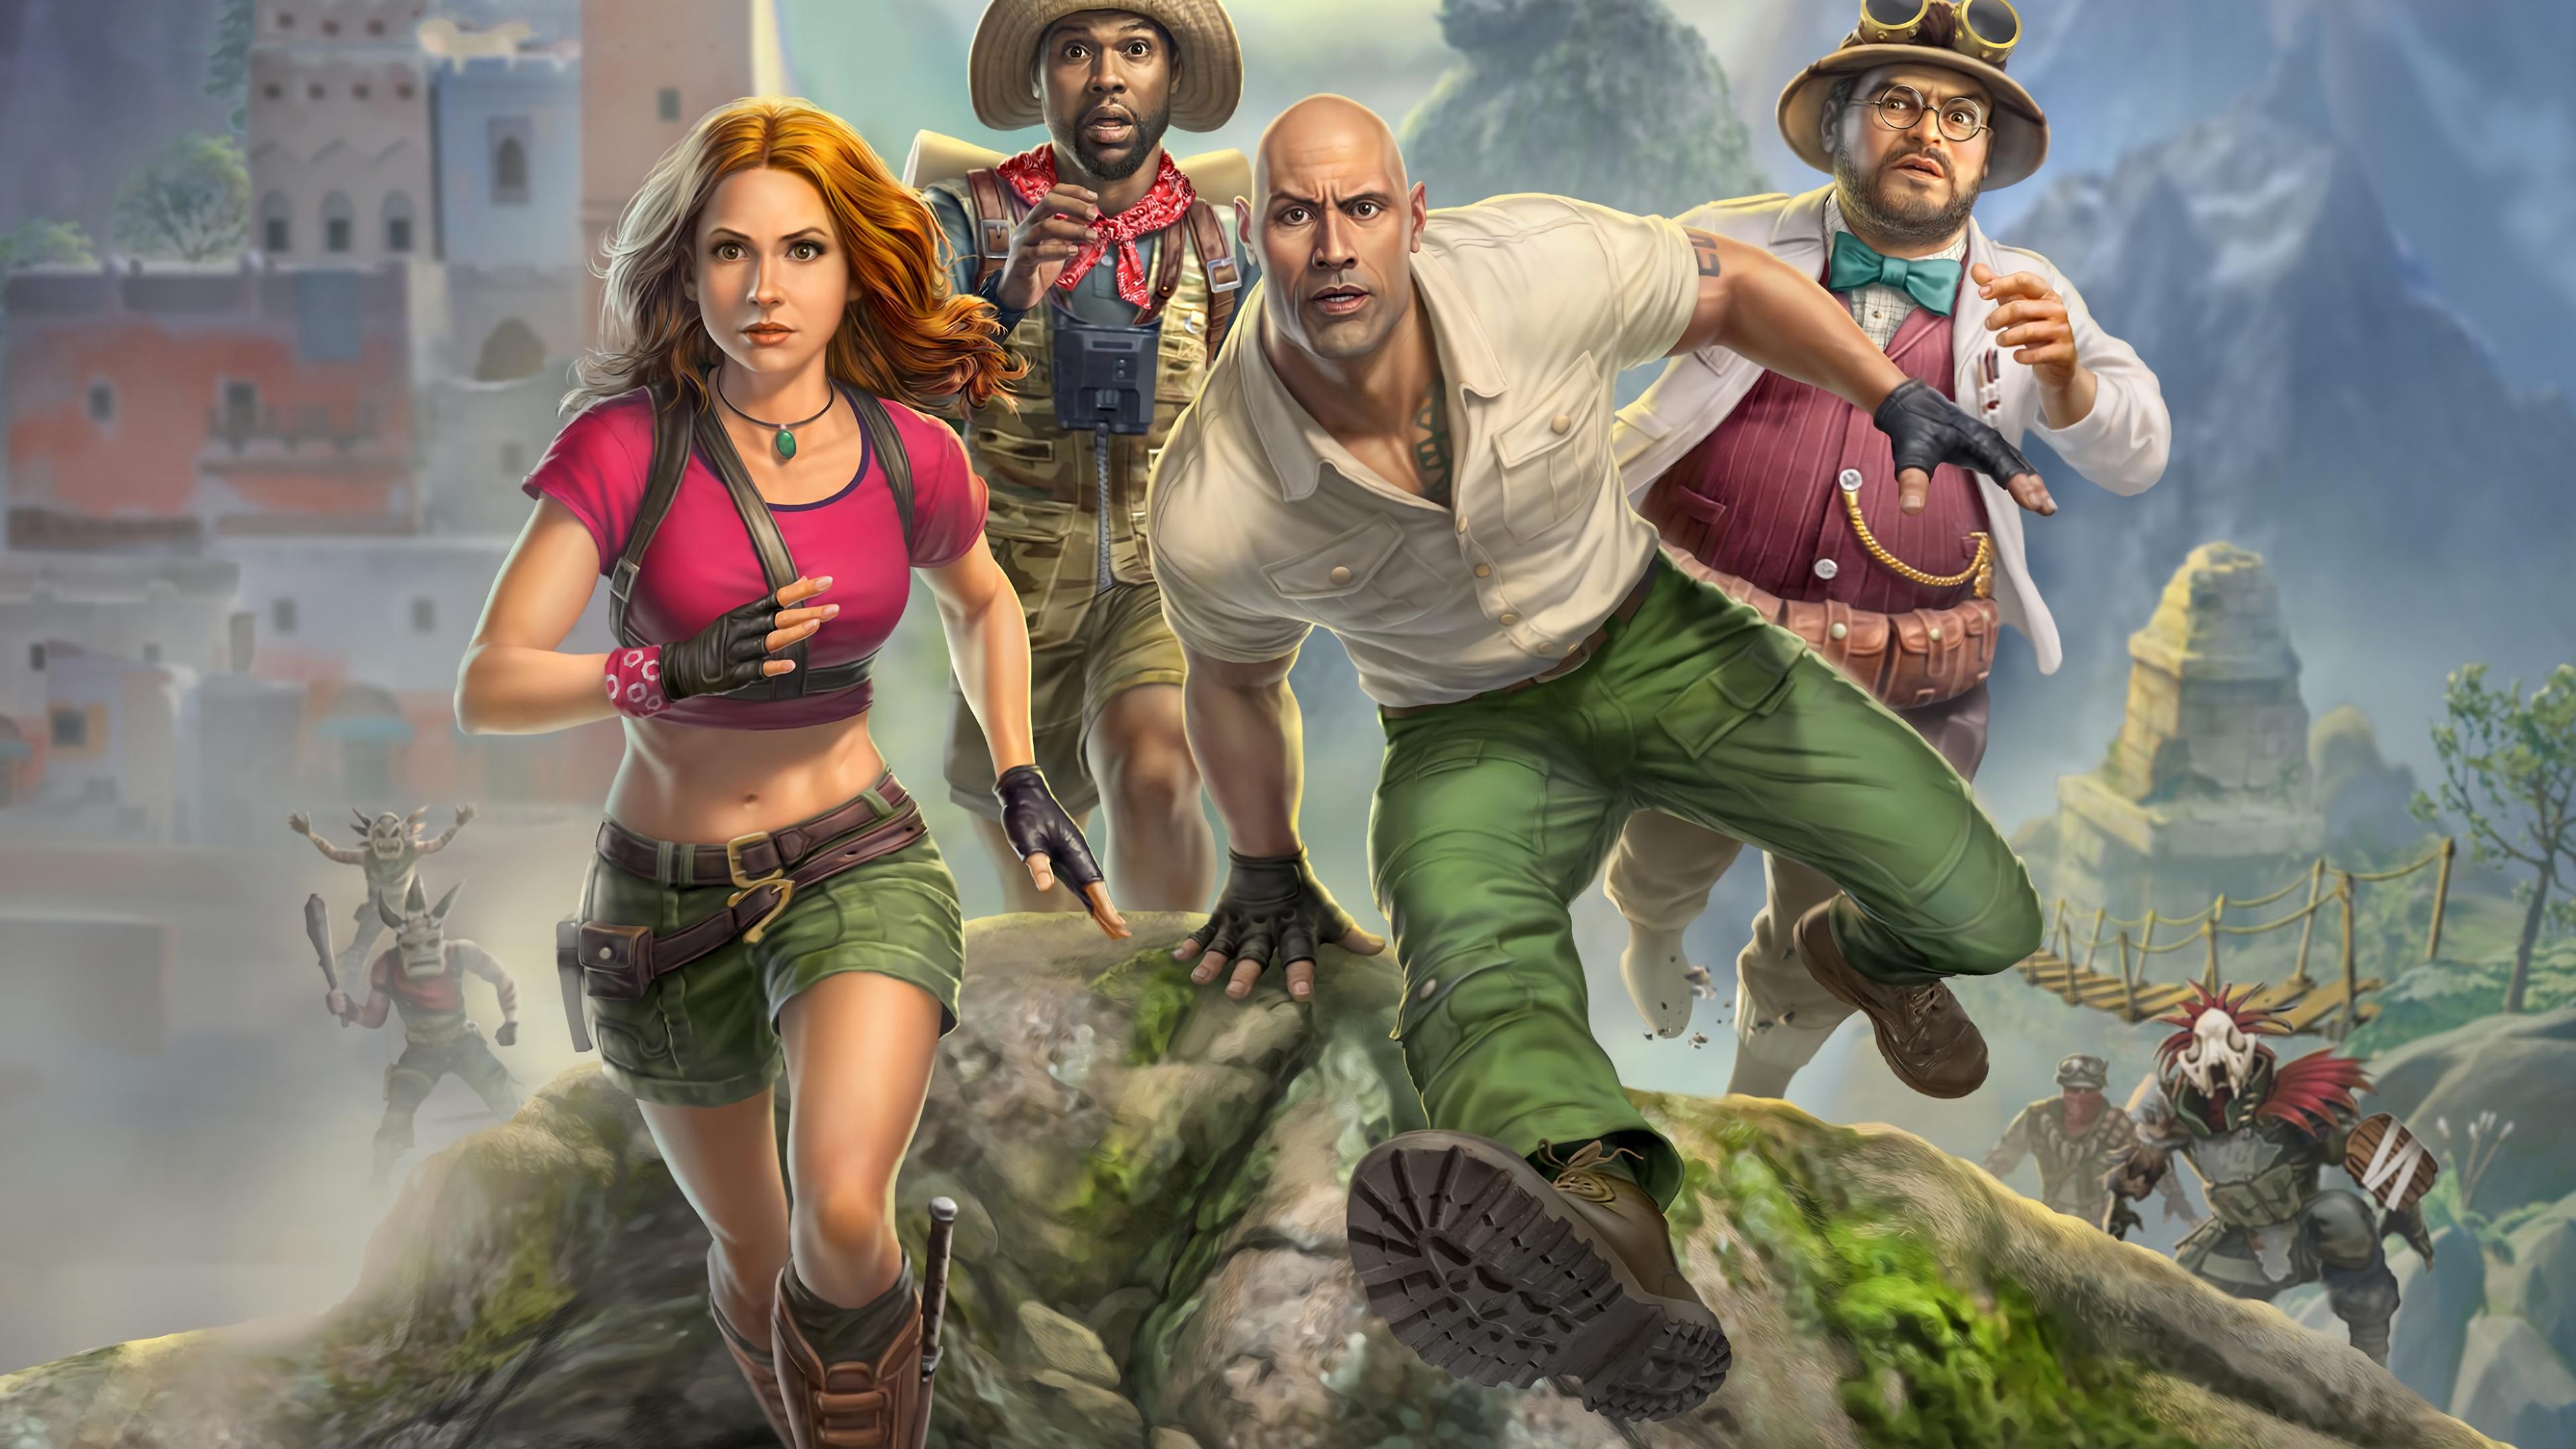 Jumanji The Video Game , HD Wallpaper & Backgrounds